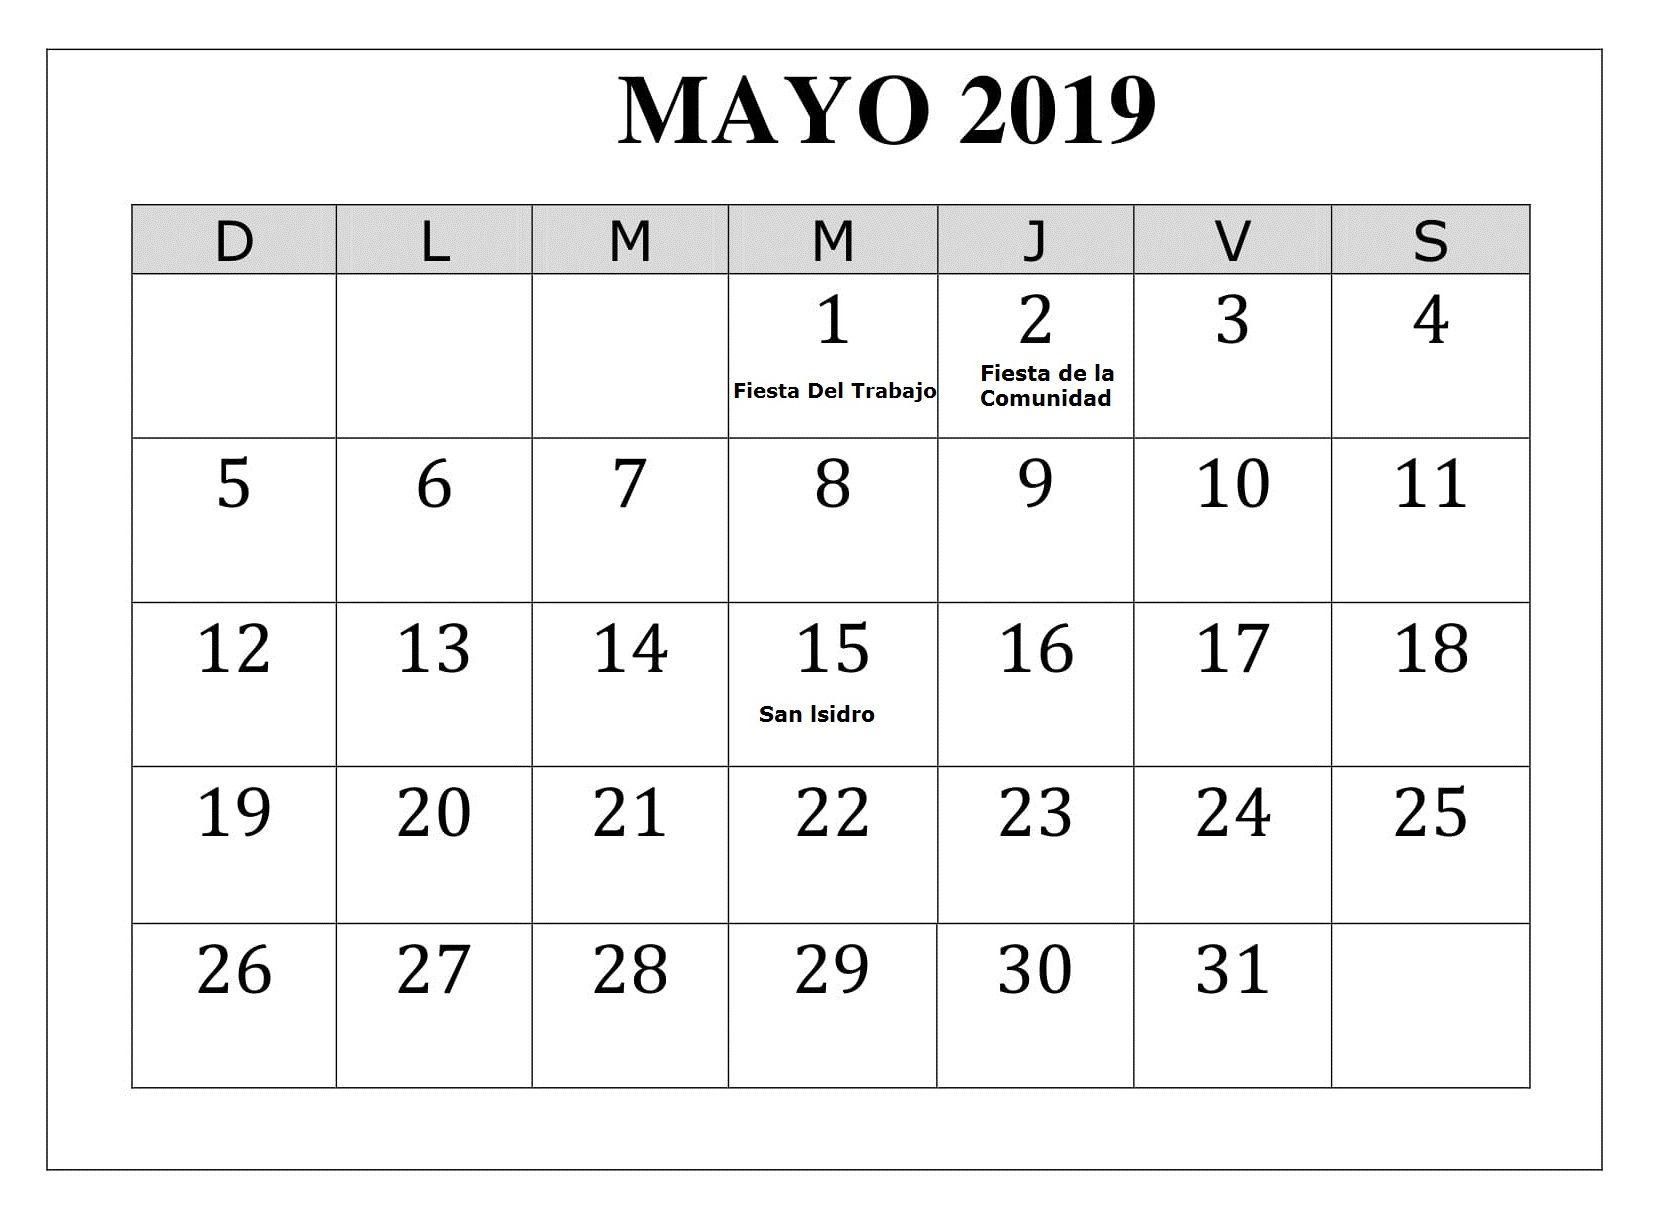 Calendario Grande.Mayo 2019 Calendario Con Festivos Grande Calendario Mayo